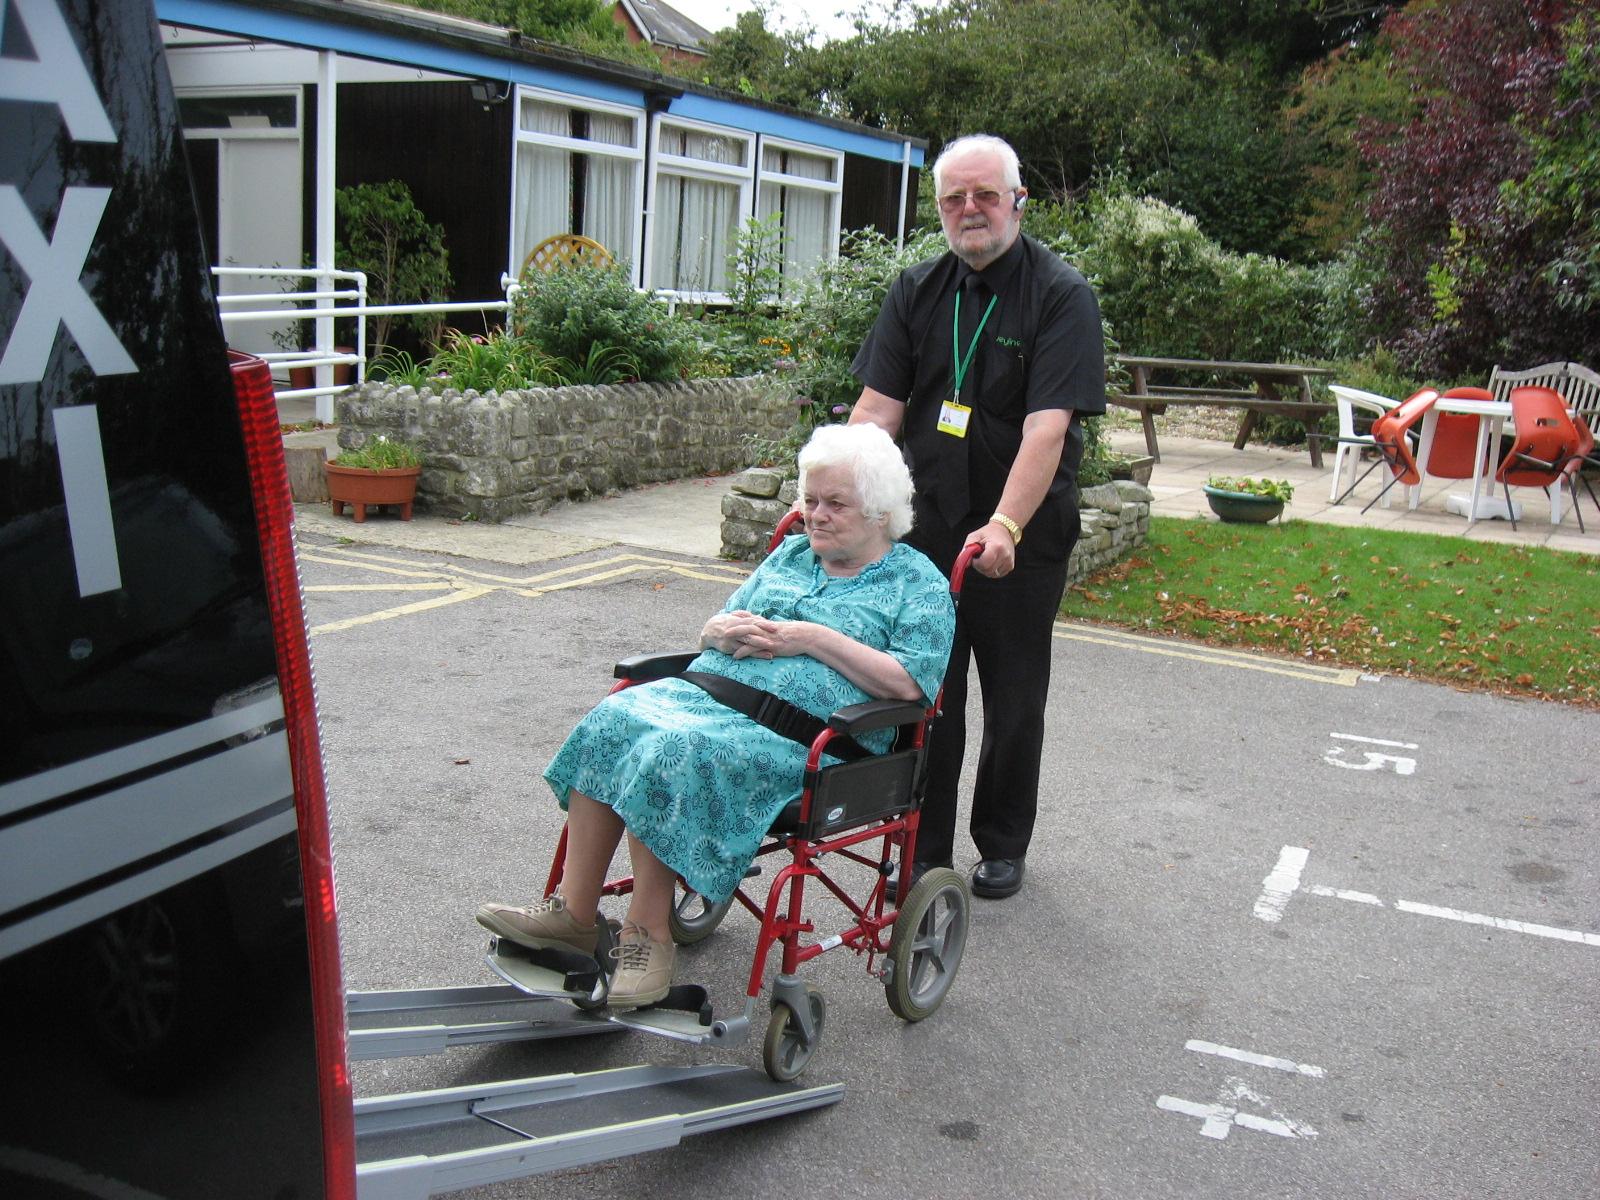 cig bins and wheelchair pics 022